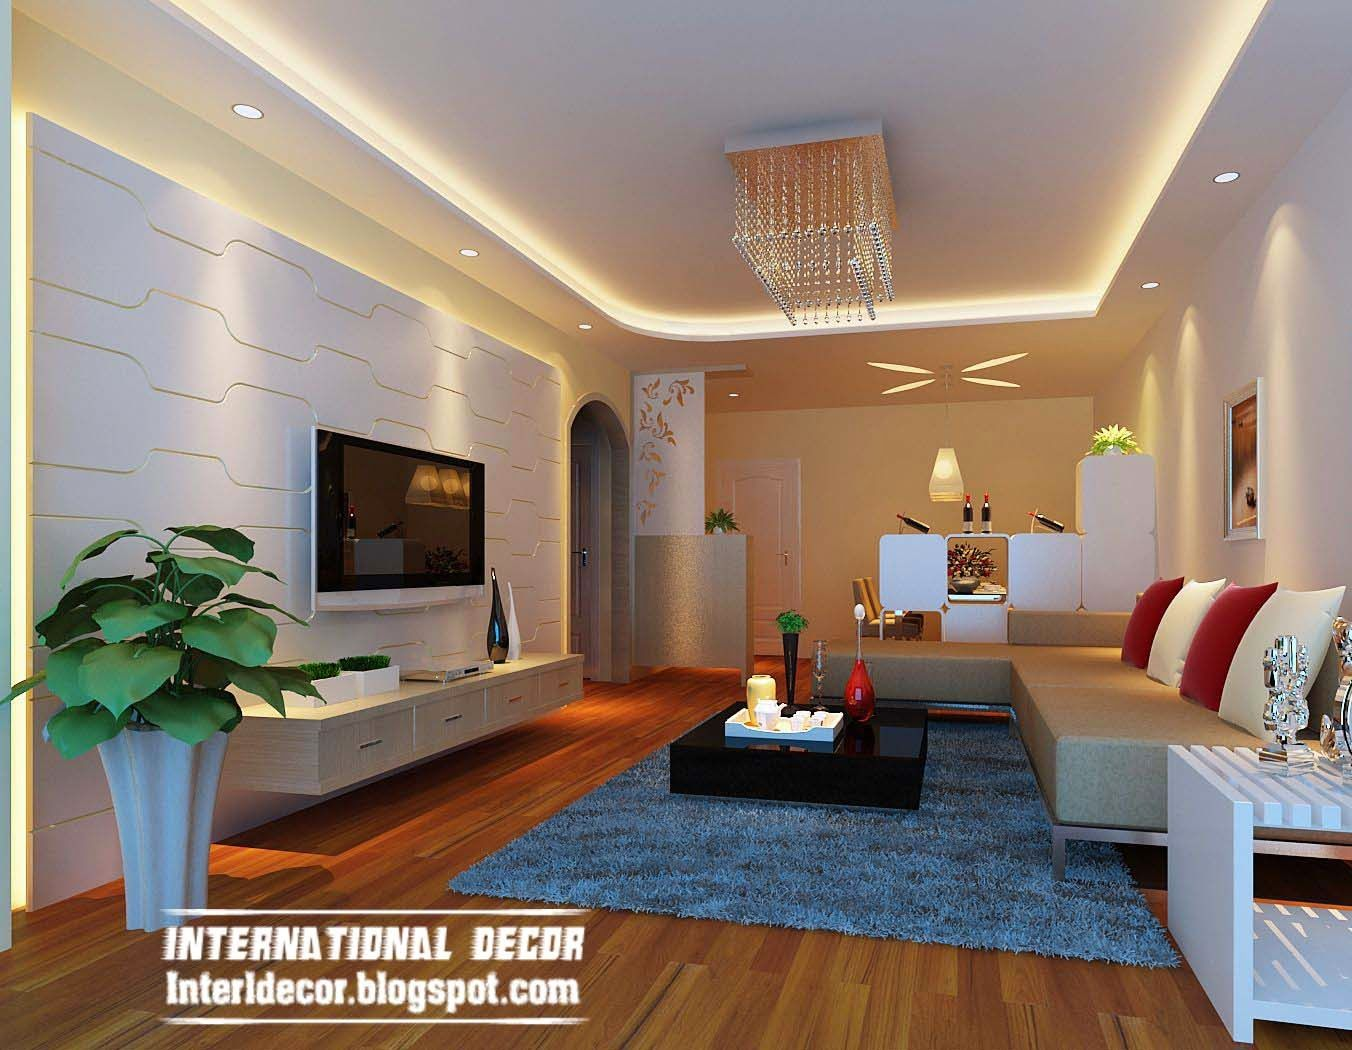 Top 20 Suspended Ceiling Tiles Lighting Pop Designs For Living Room 2015 Part 2